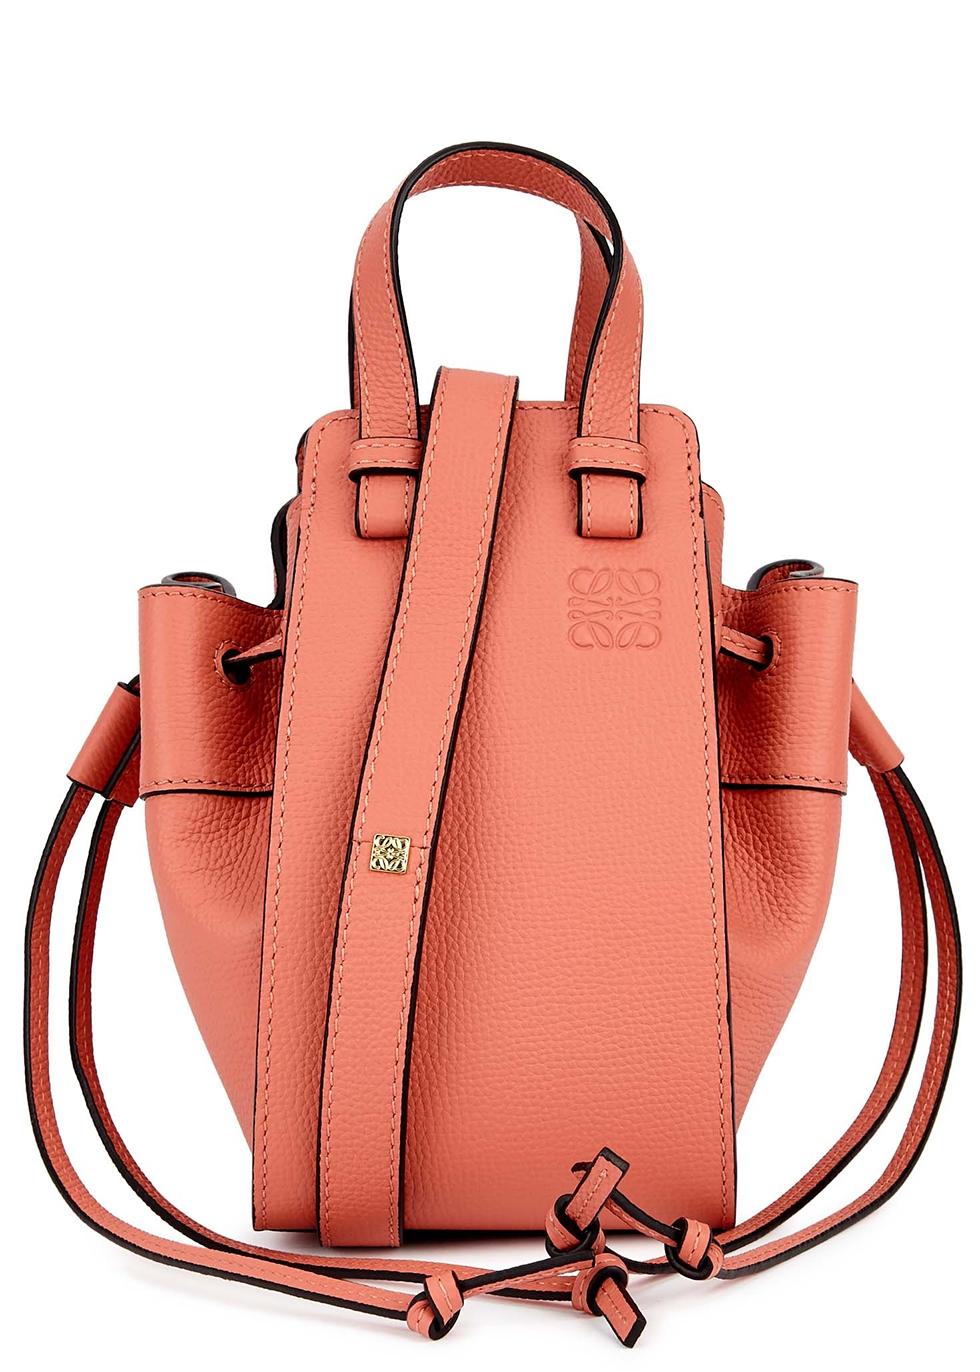 Hammock mini salmon leather cross-body bag